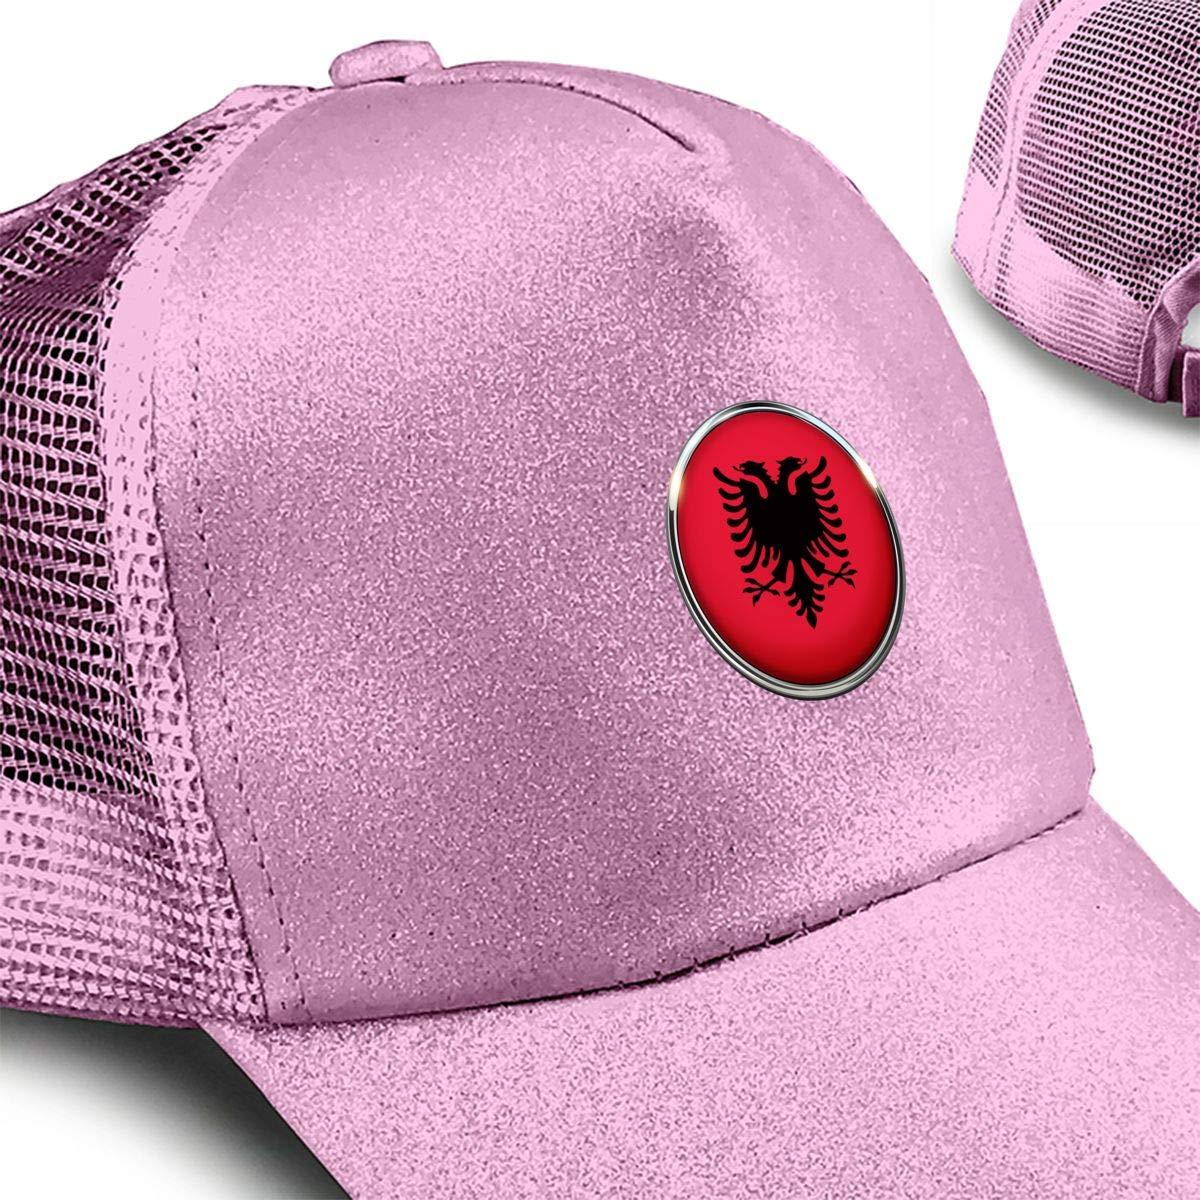 Albania Ponytail Messy High Bun Hat Ponycaps Baseball Cap Adjustable Trucker Cap Mesh Cap